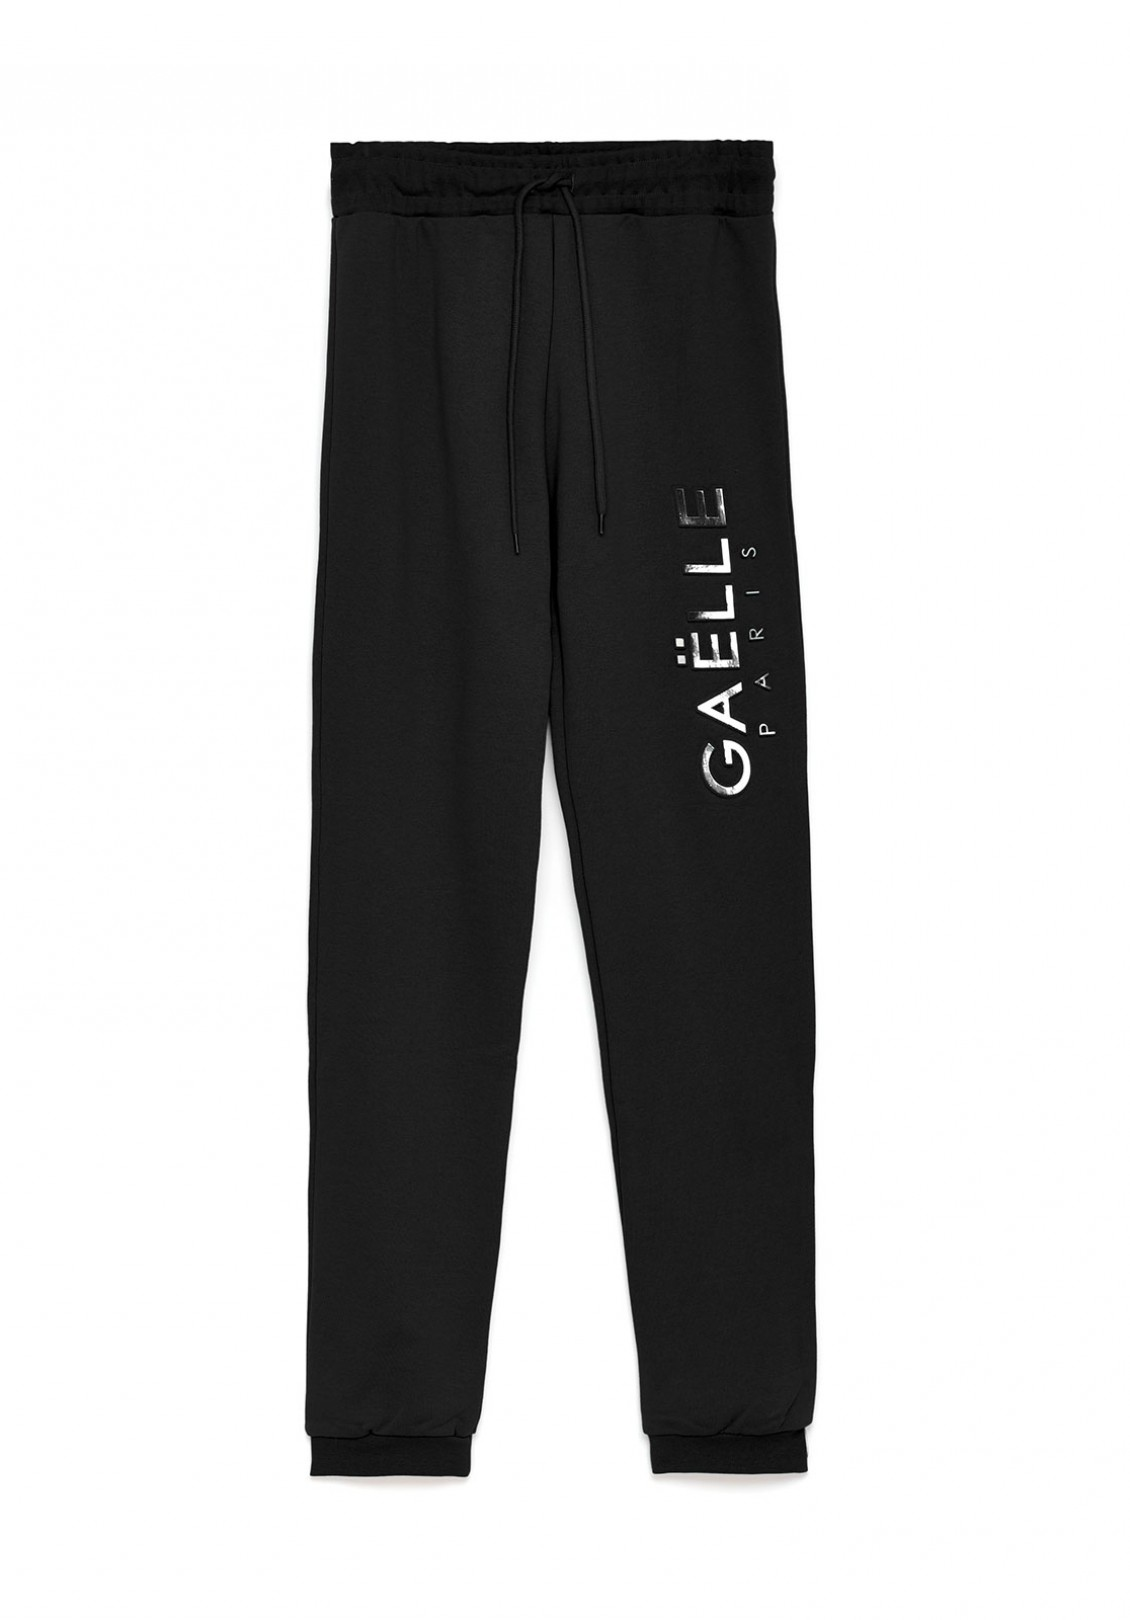 Gaelle Pantaloni felpa Donna Nero Gaelle | GBD8816NERO